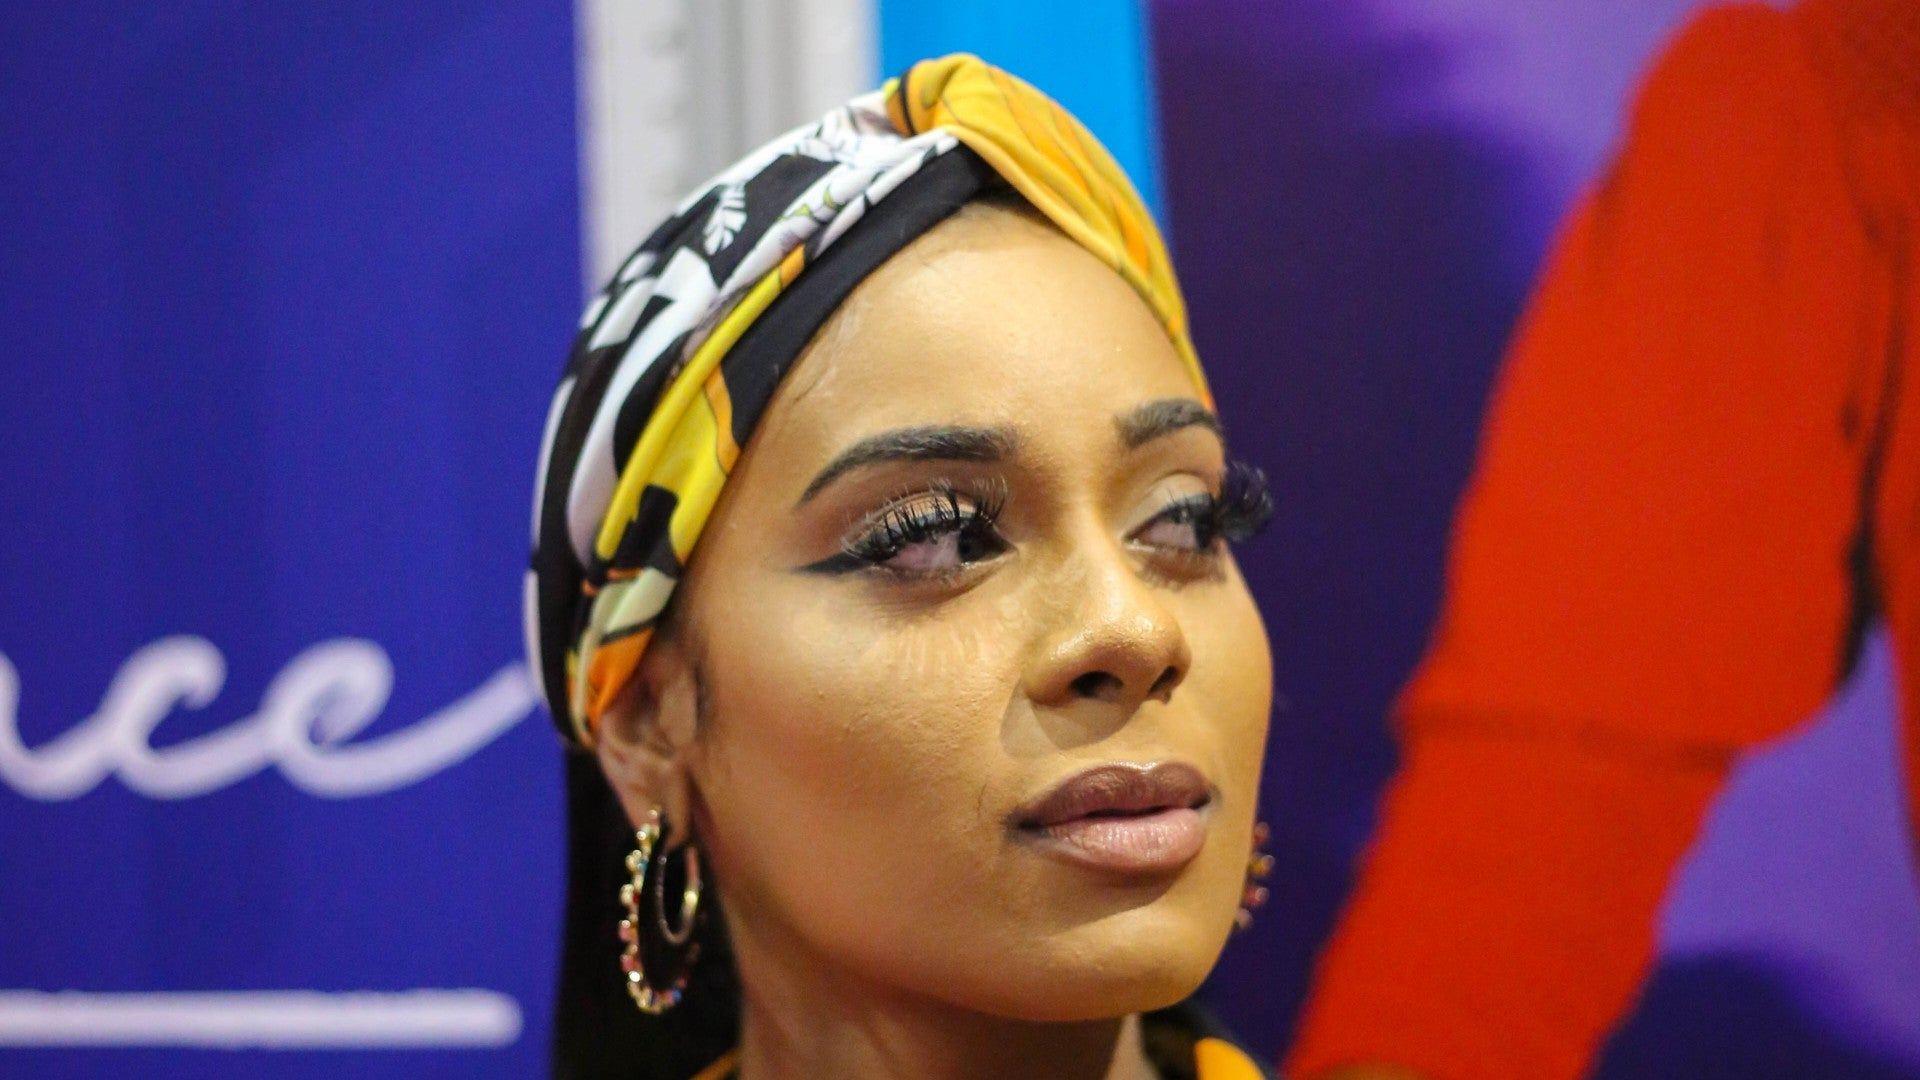 The Best Head Wraps On Black Women At Essence Festival